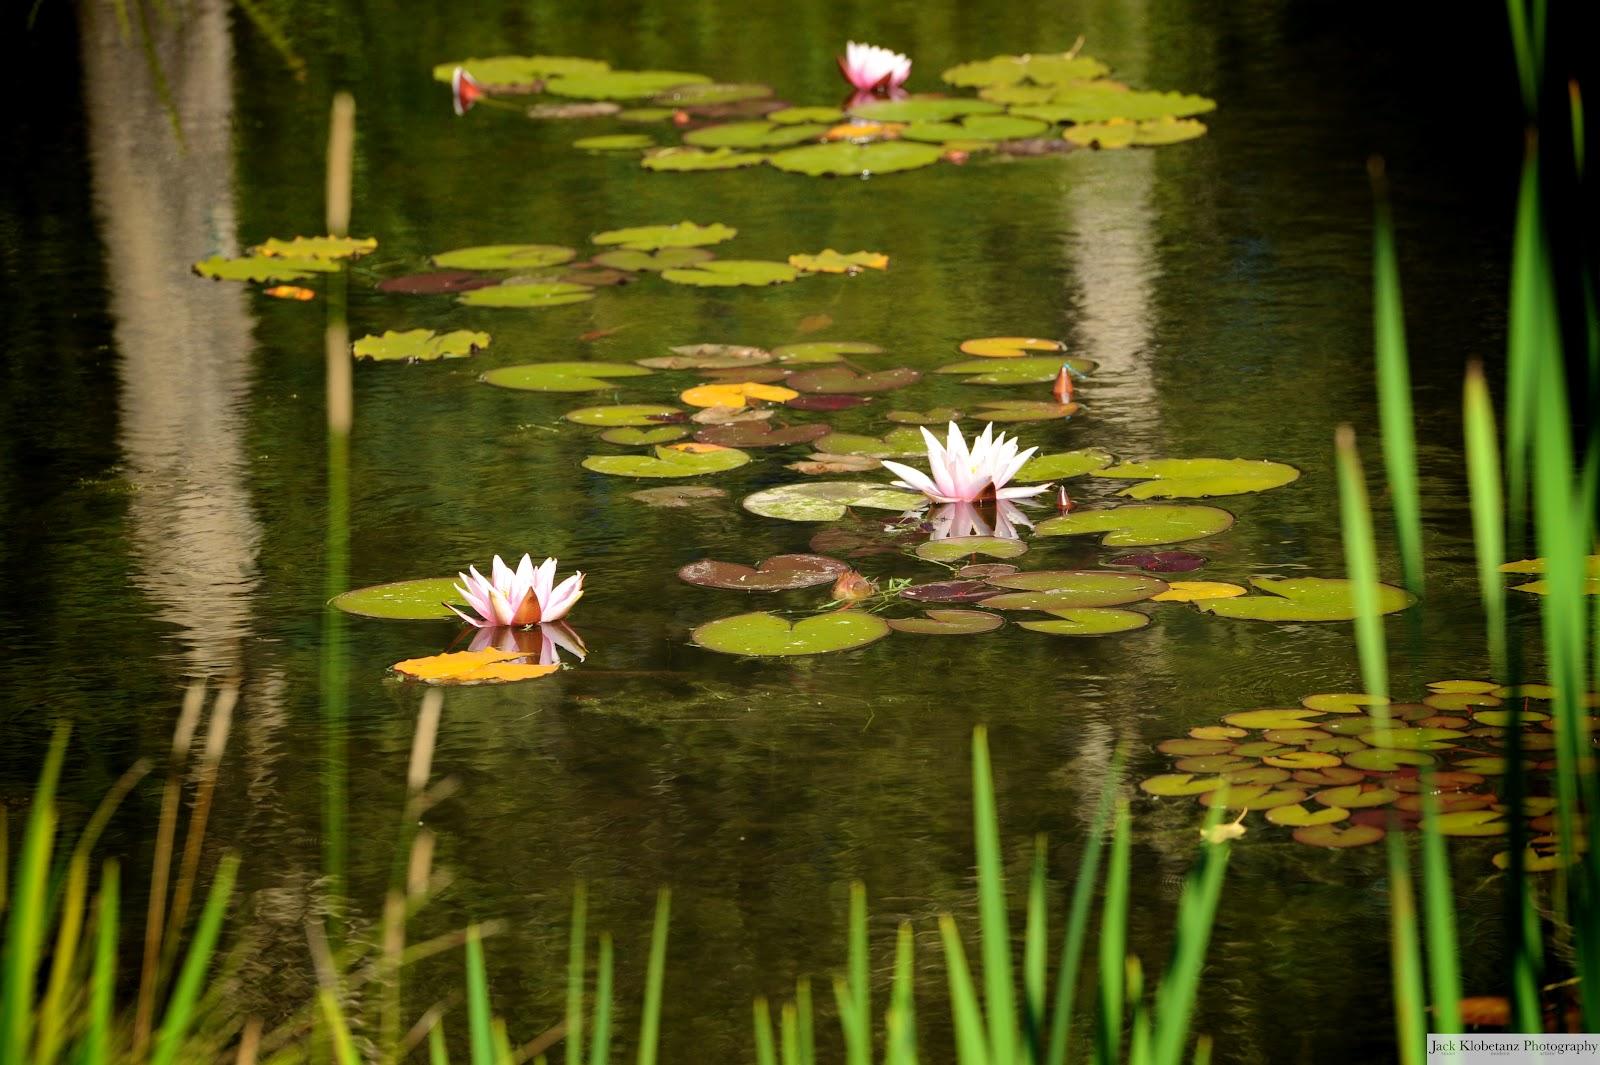 Denise Jack Botanical Gardens Steamboat Springs Colorado Jack Klobetanz Photography